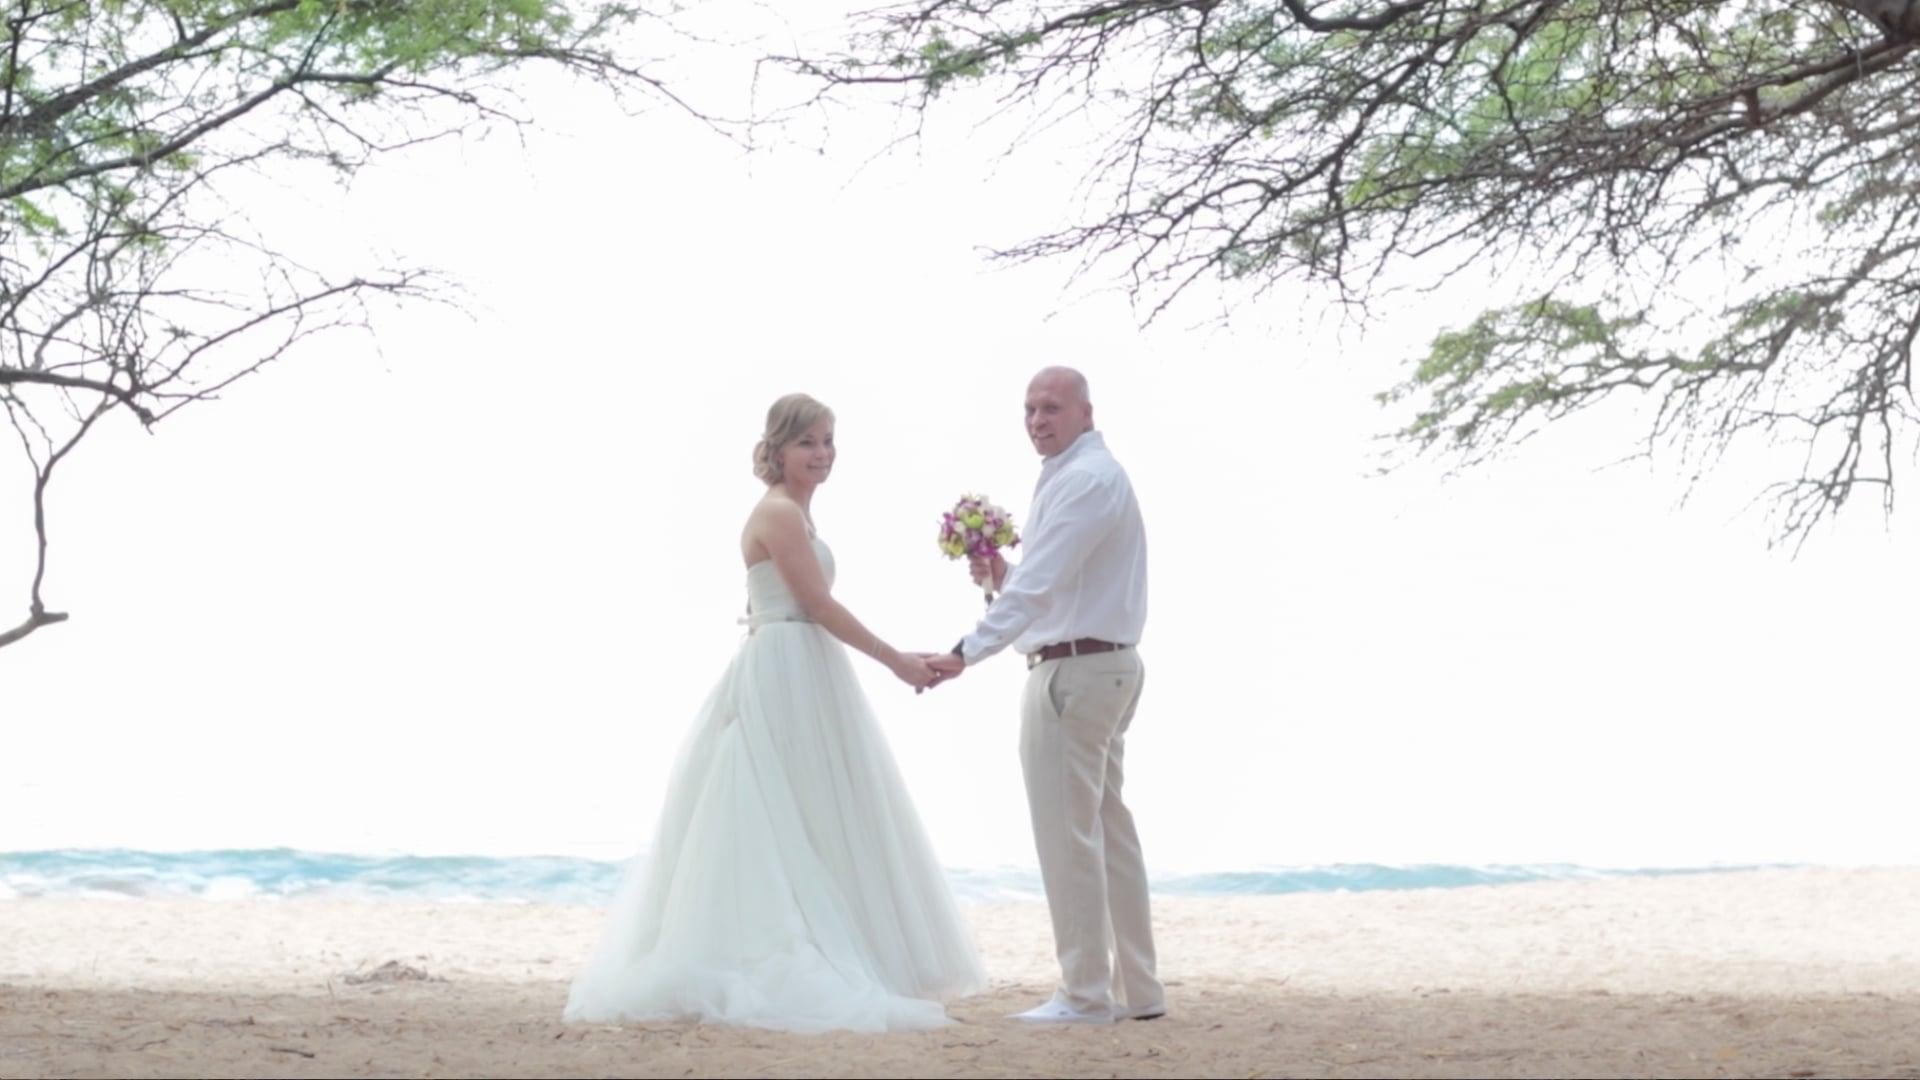 Duewel Elopement Wedding on Maui